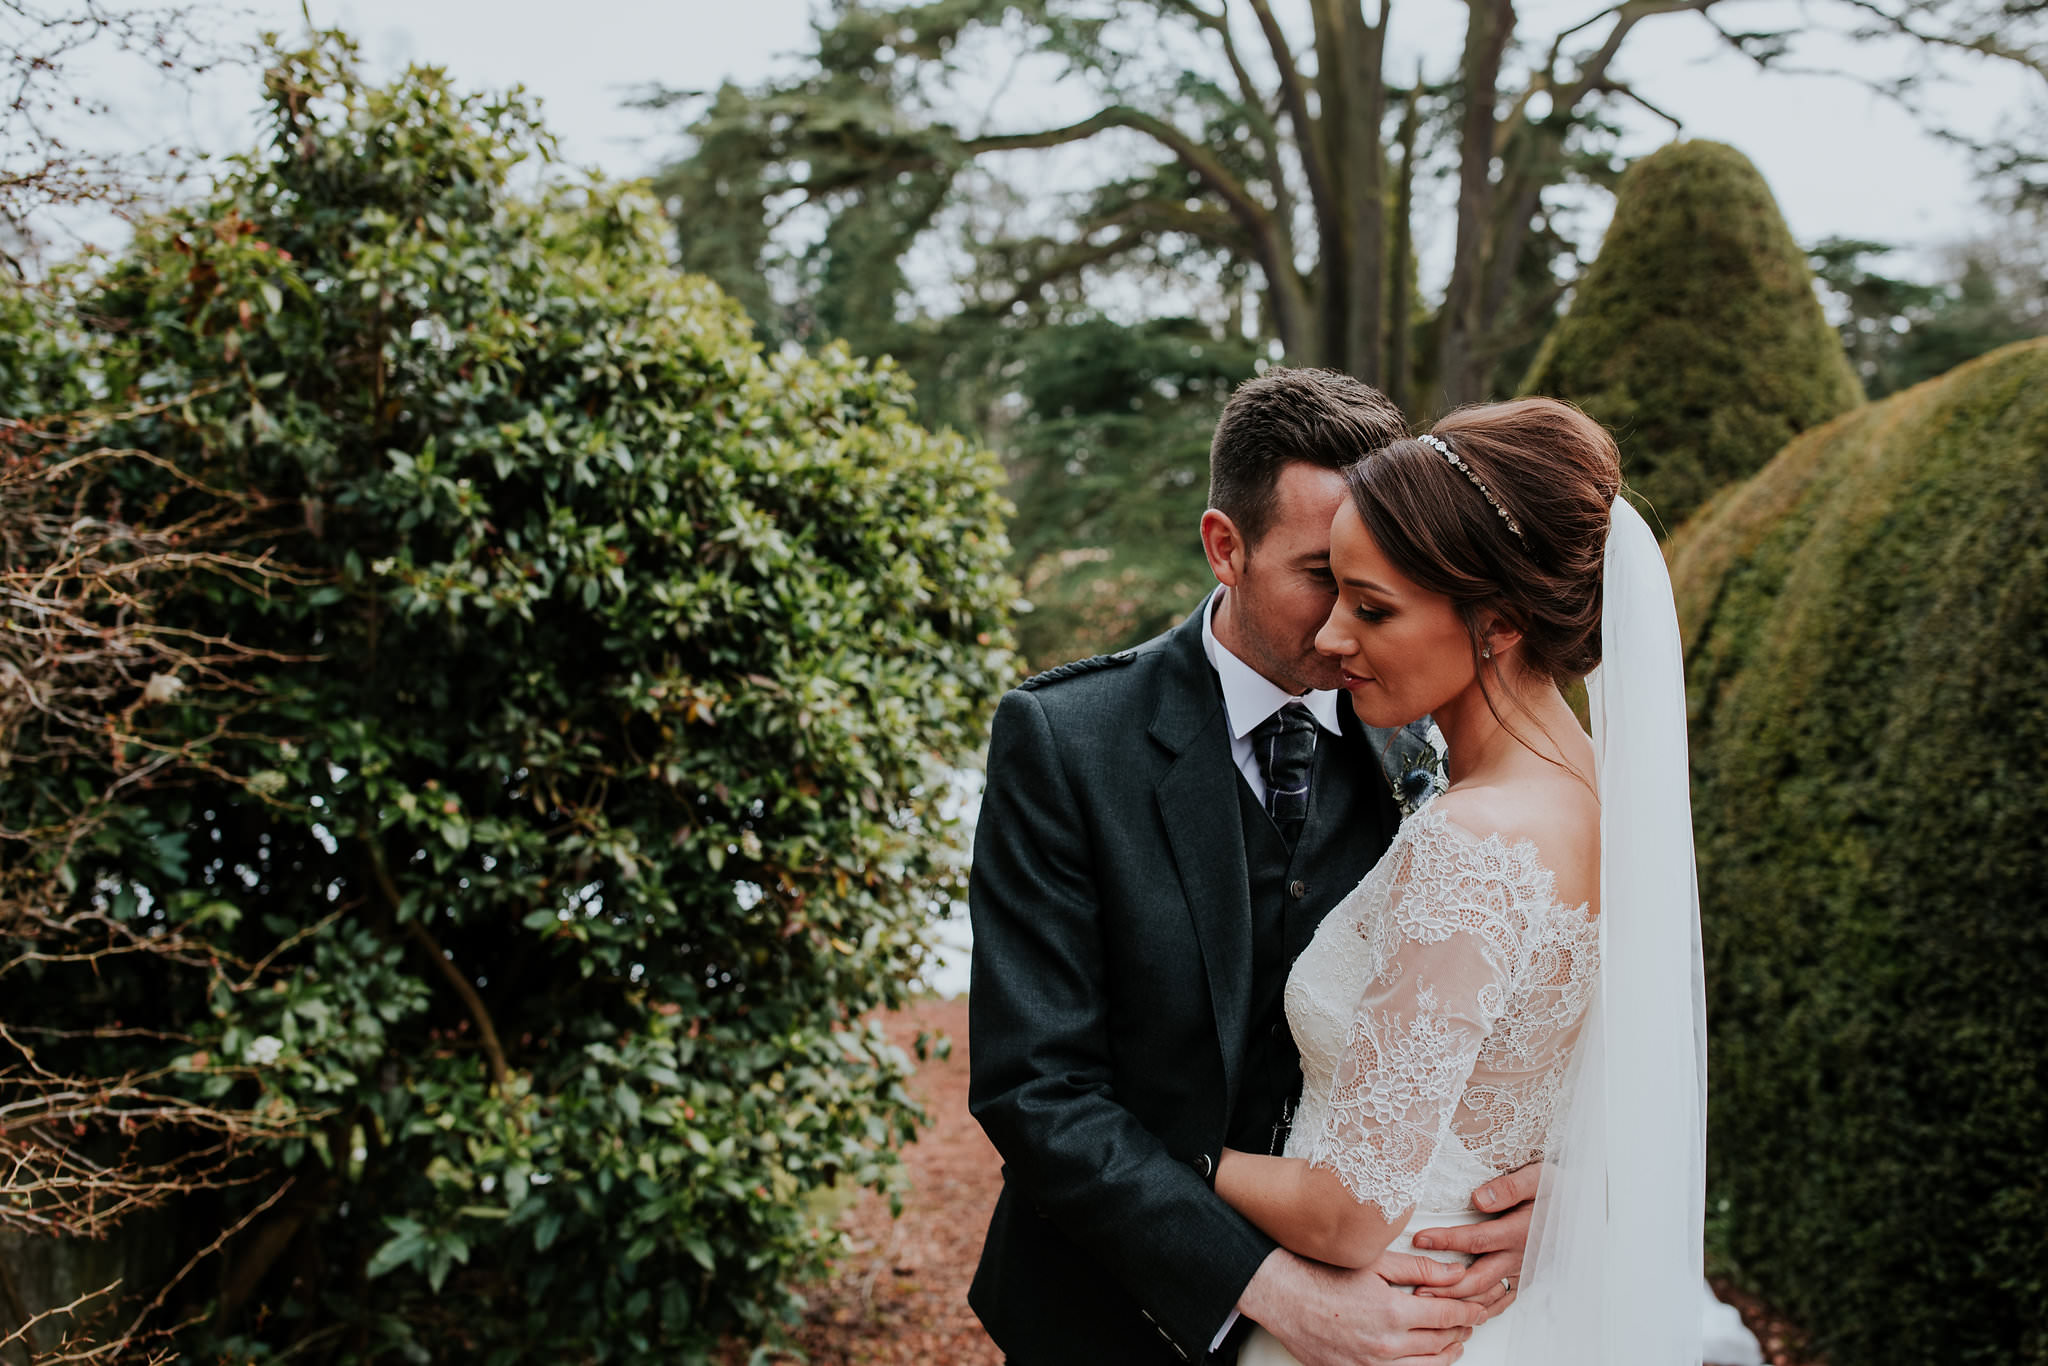 kirknewton stables wedding photographer (50).jpg